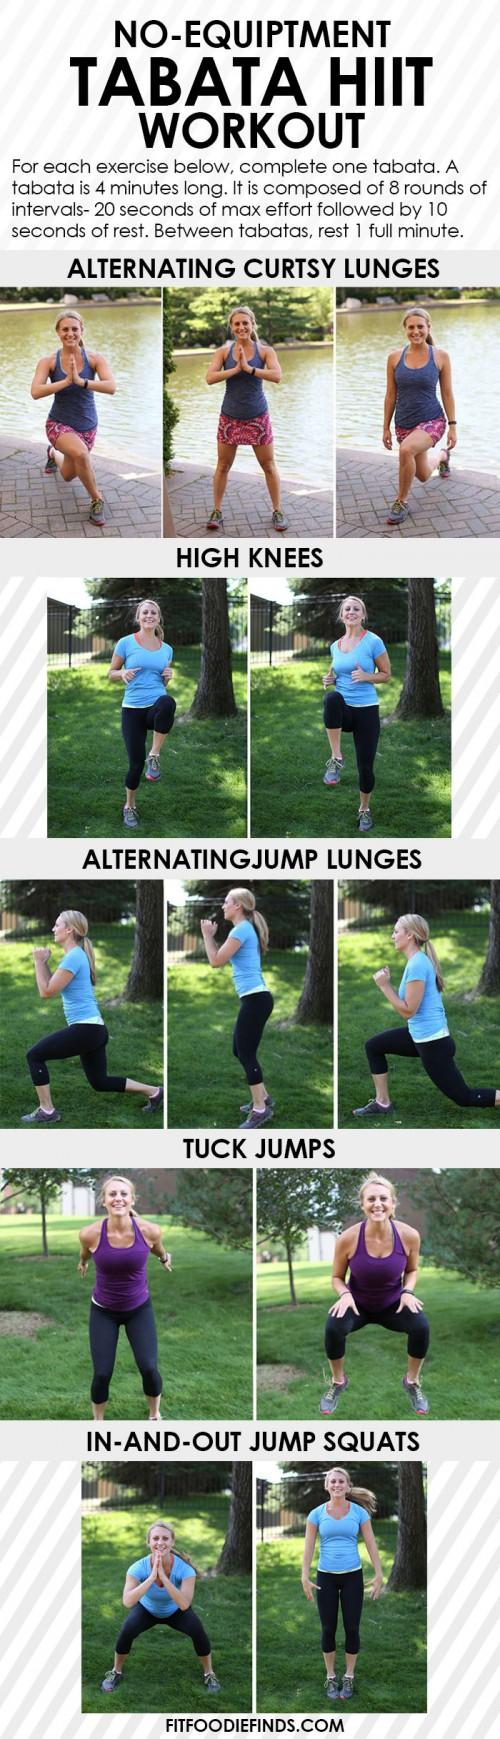 no equipment tabata workout